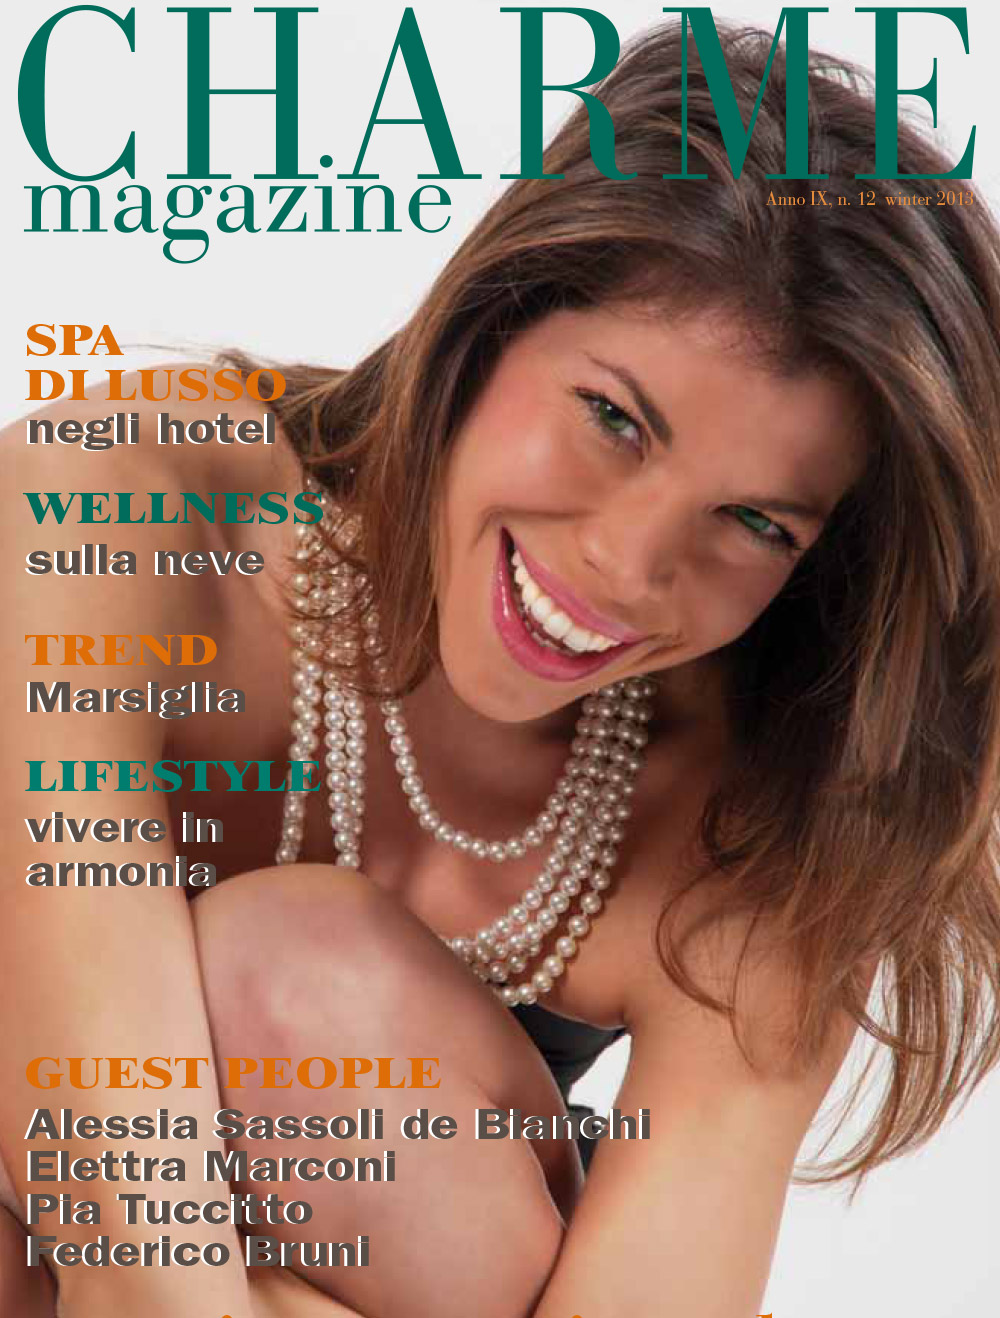 Charme magazine